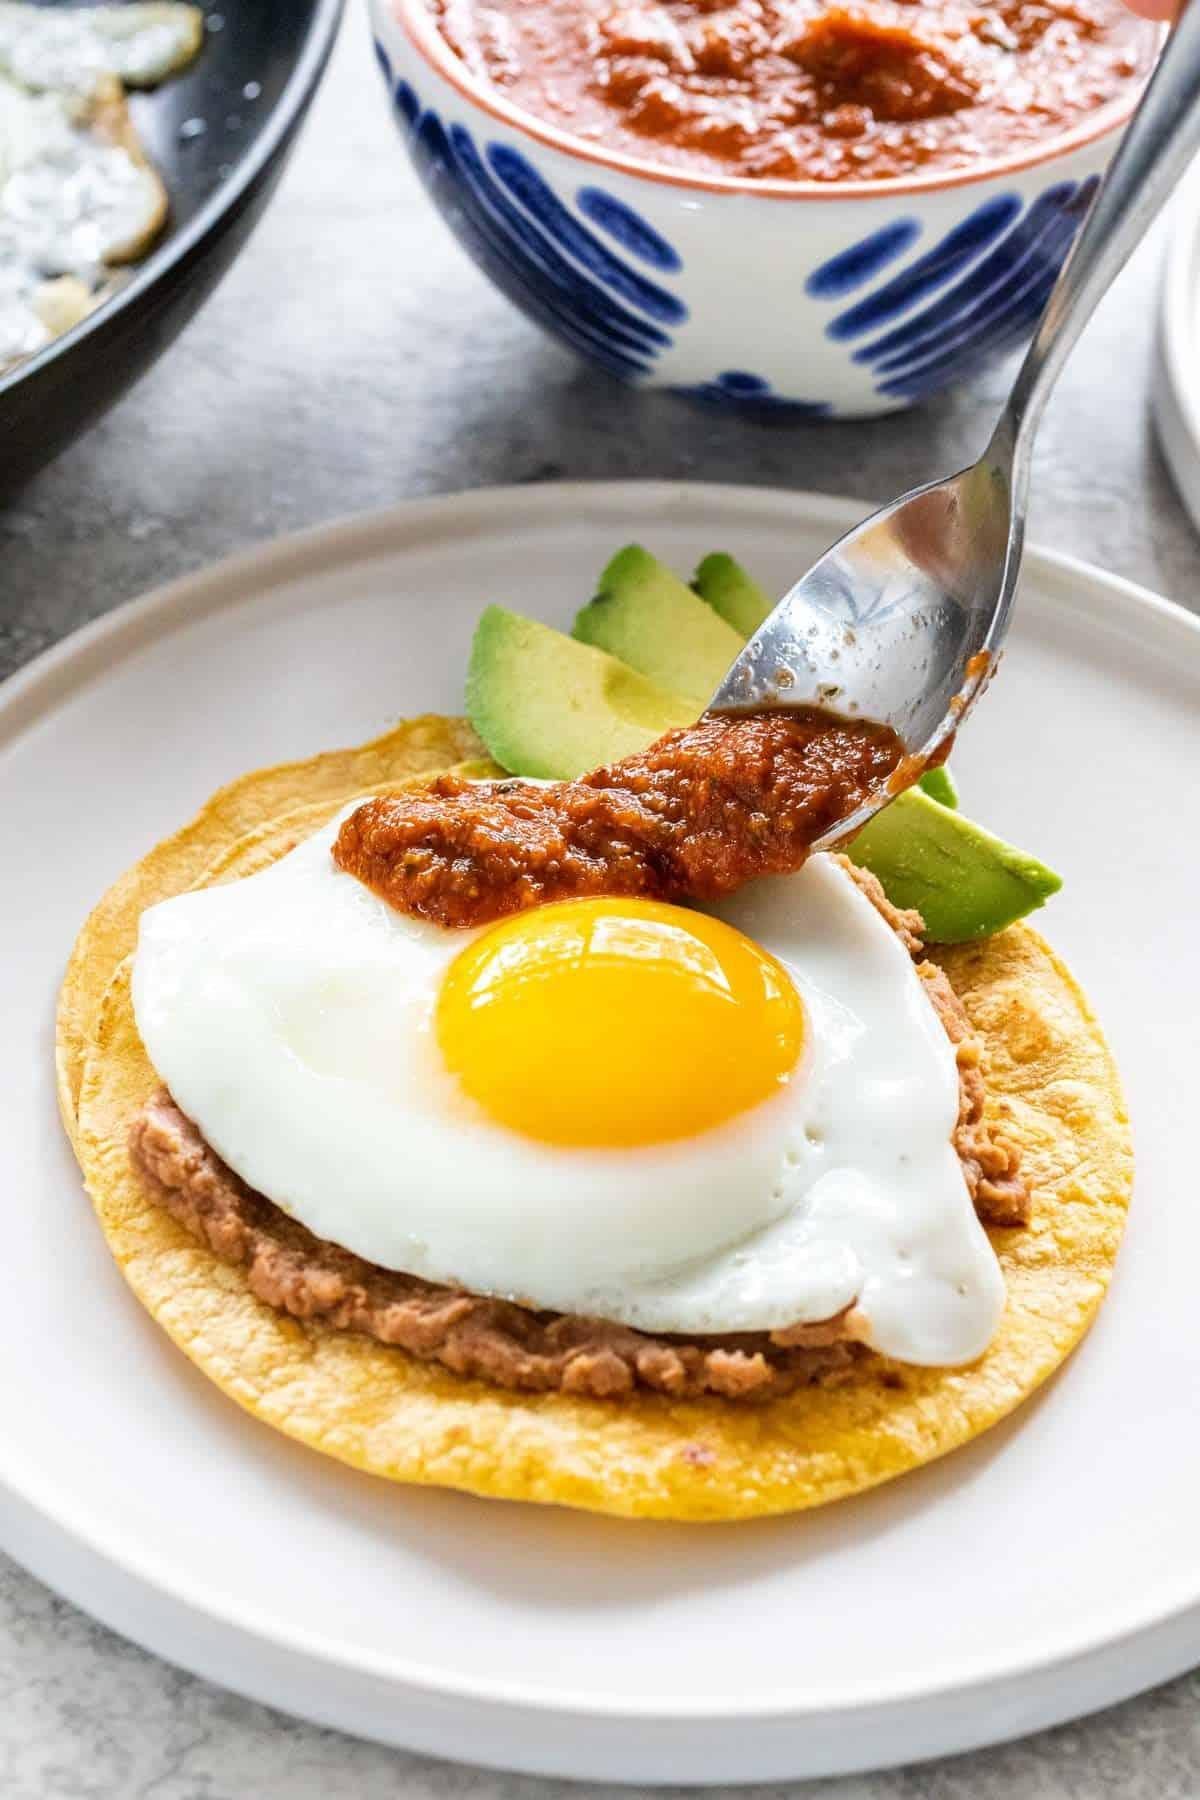 spooning ranchero sauce on the egg